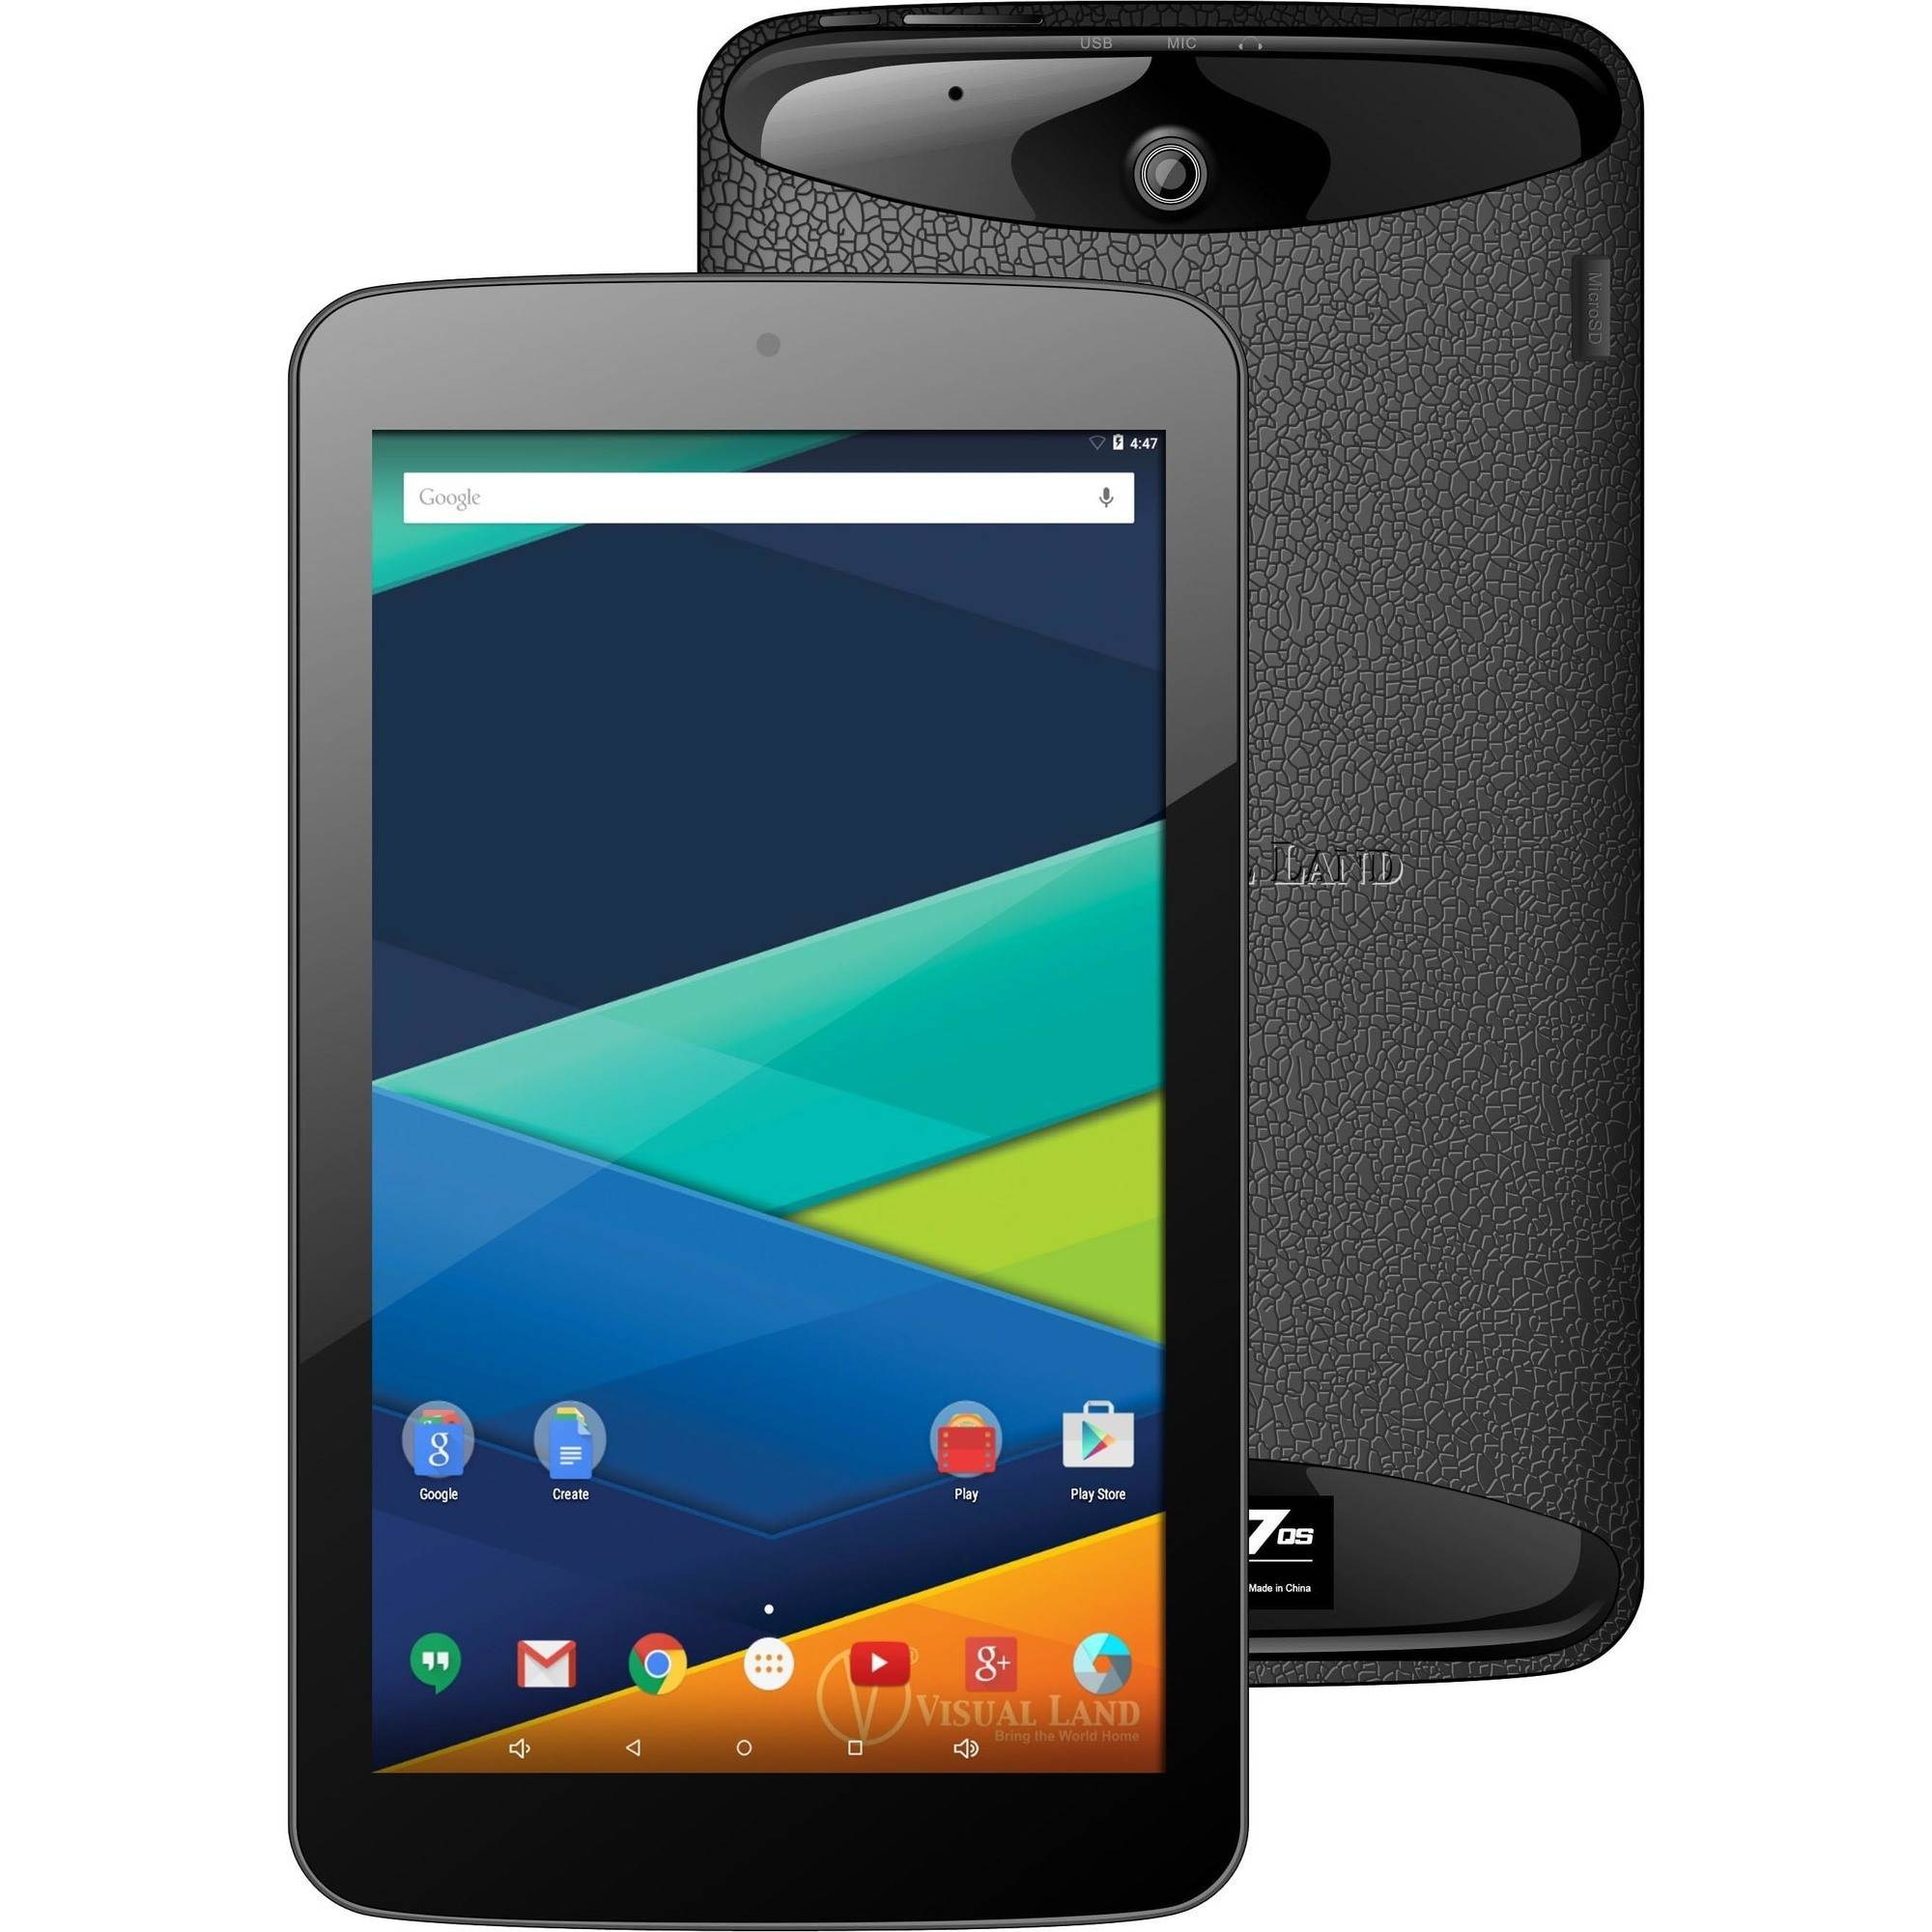 "Visual Land Prestige 7"" Quad Core Slim Tablet 8GB Android 5.0 OS"